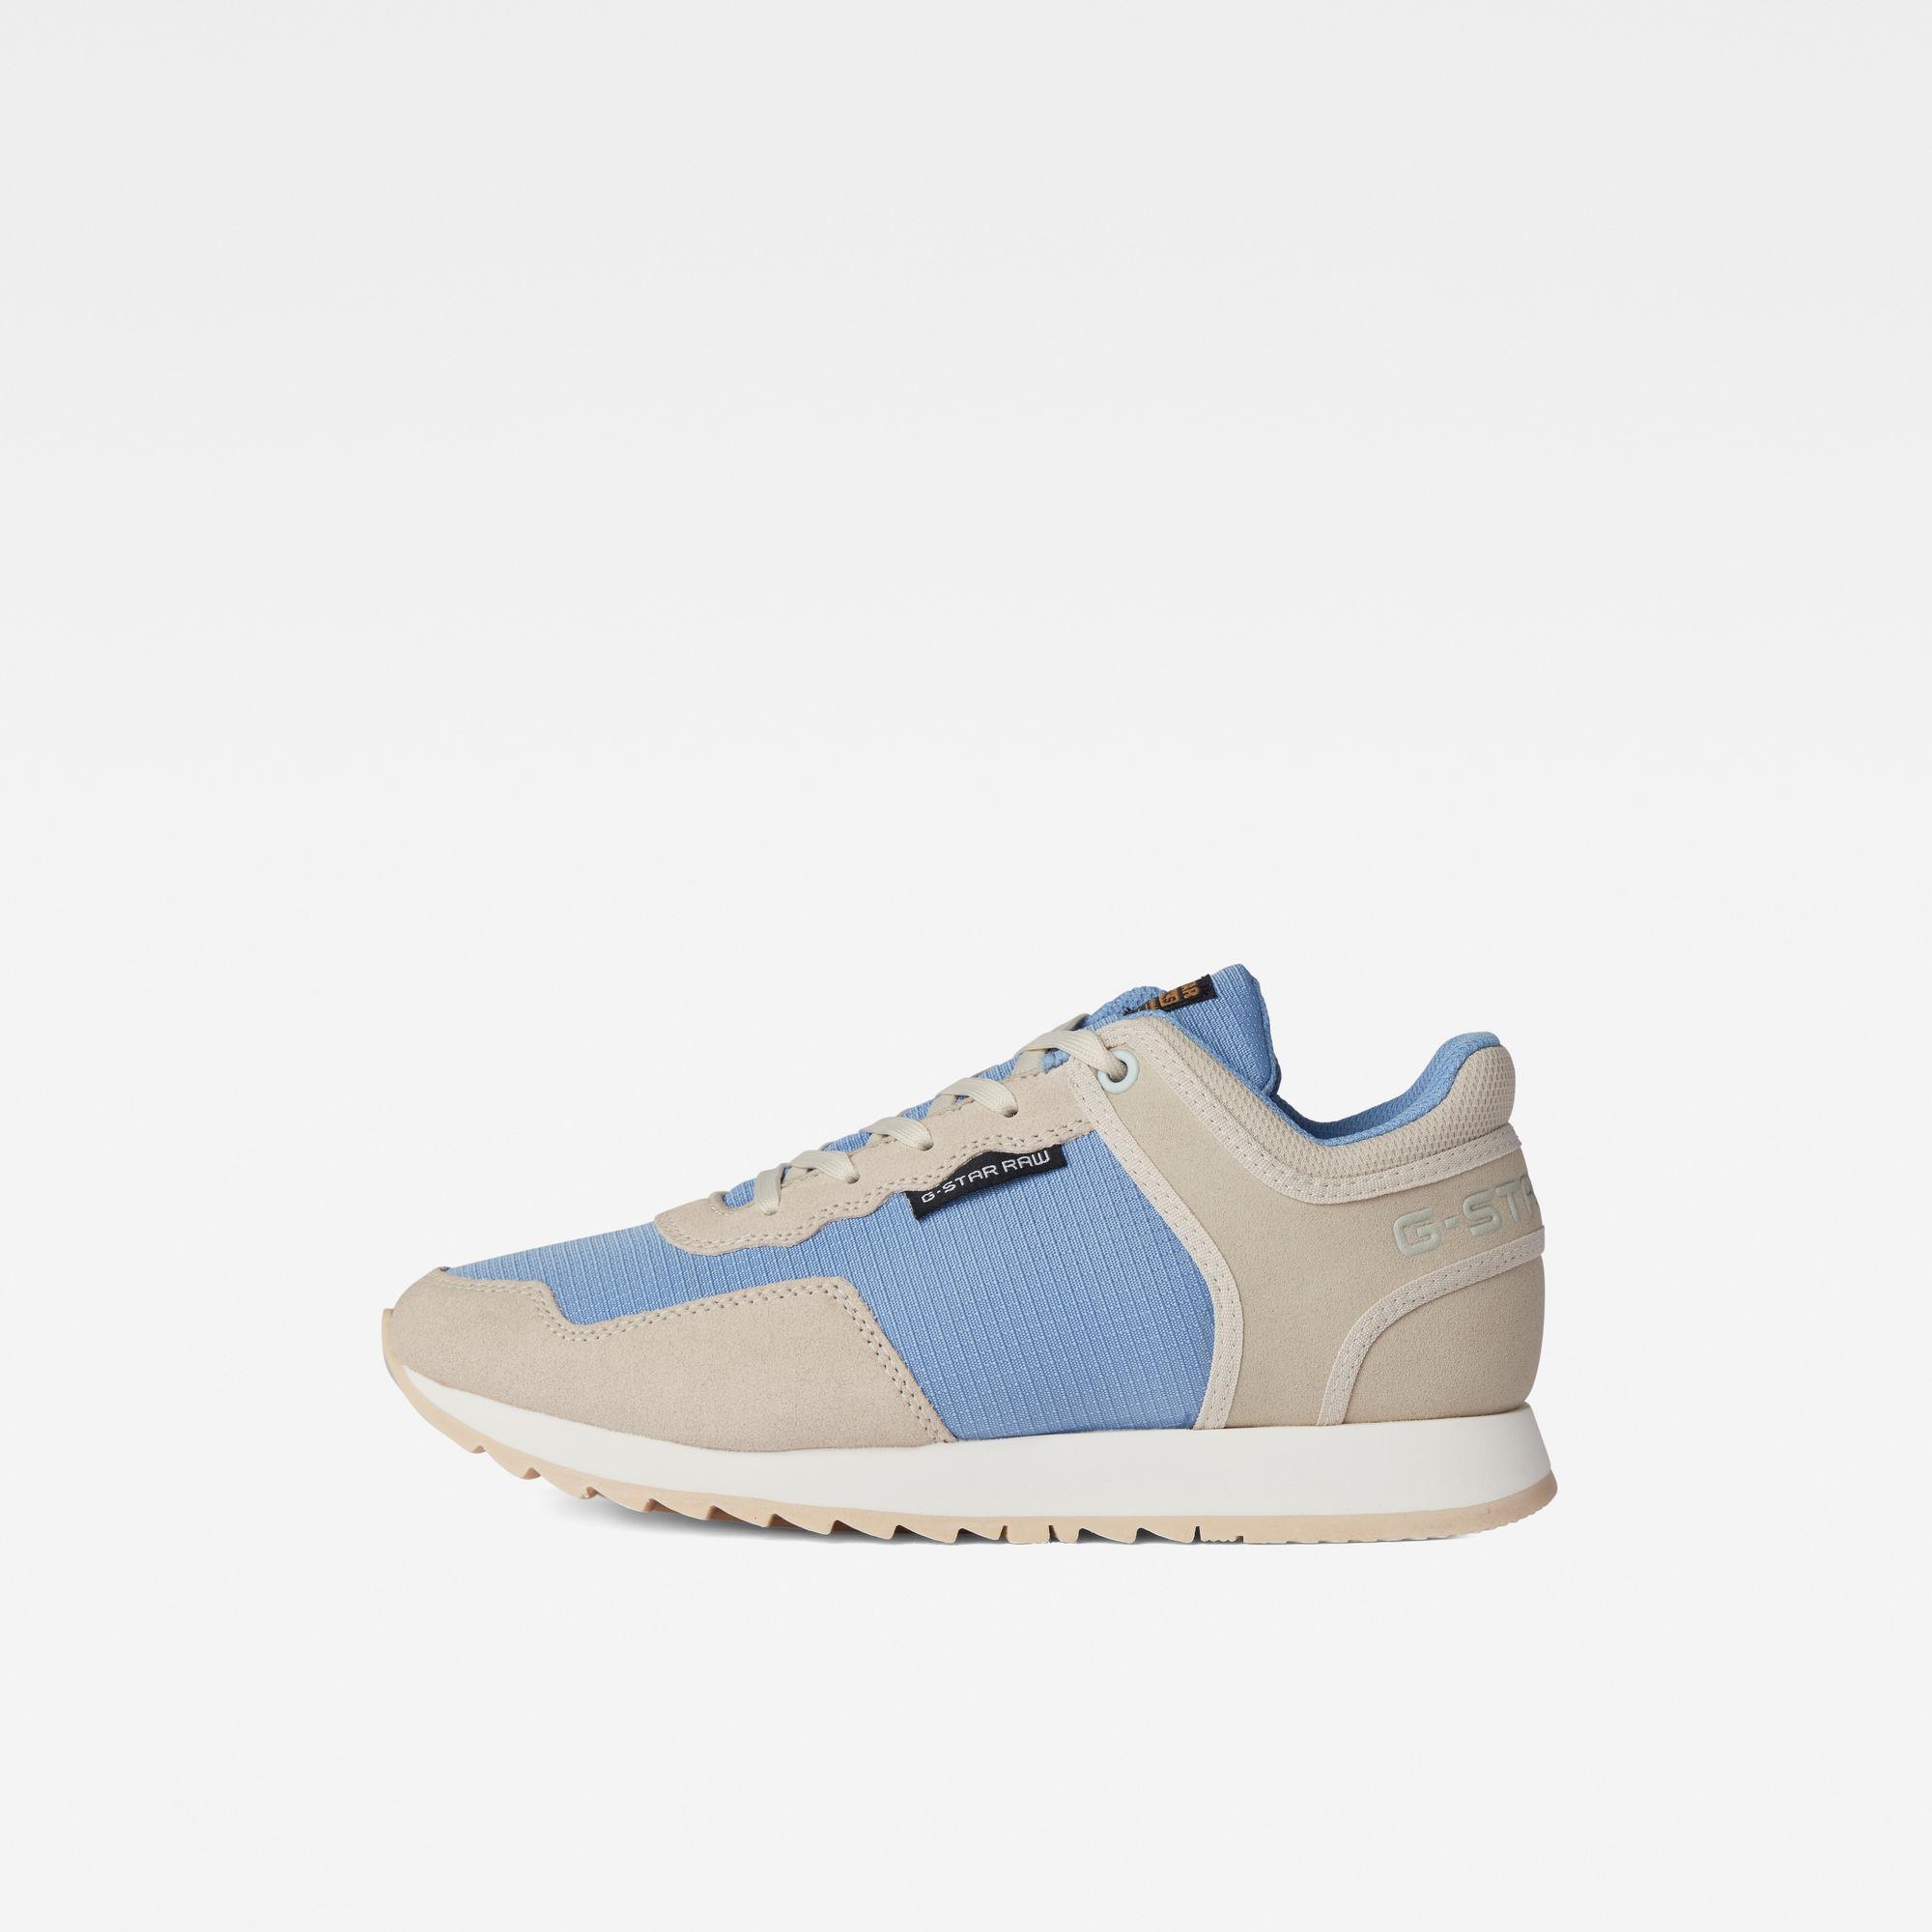 G-Star RAW Dames Calow Basic Q2 Sneakers Blauw